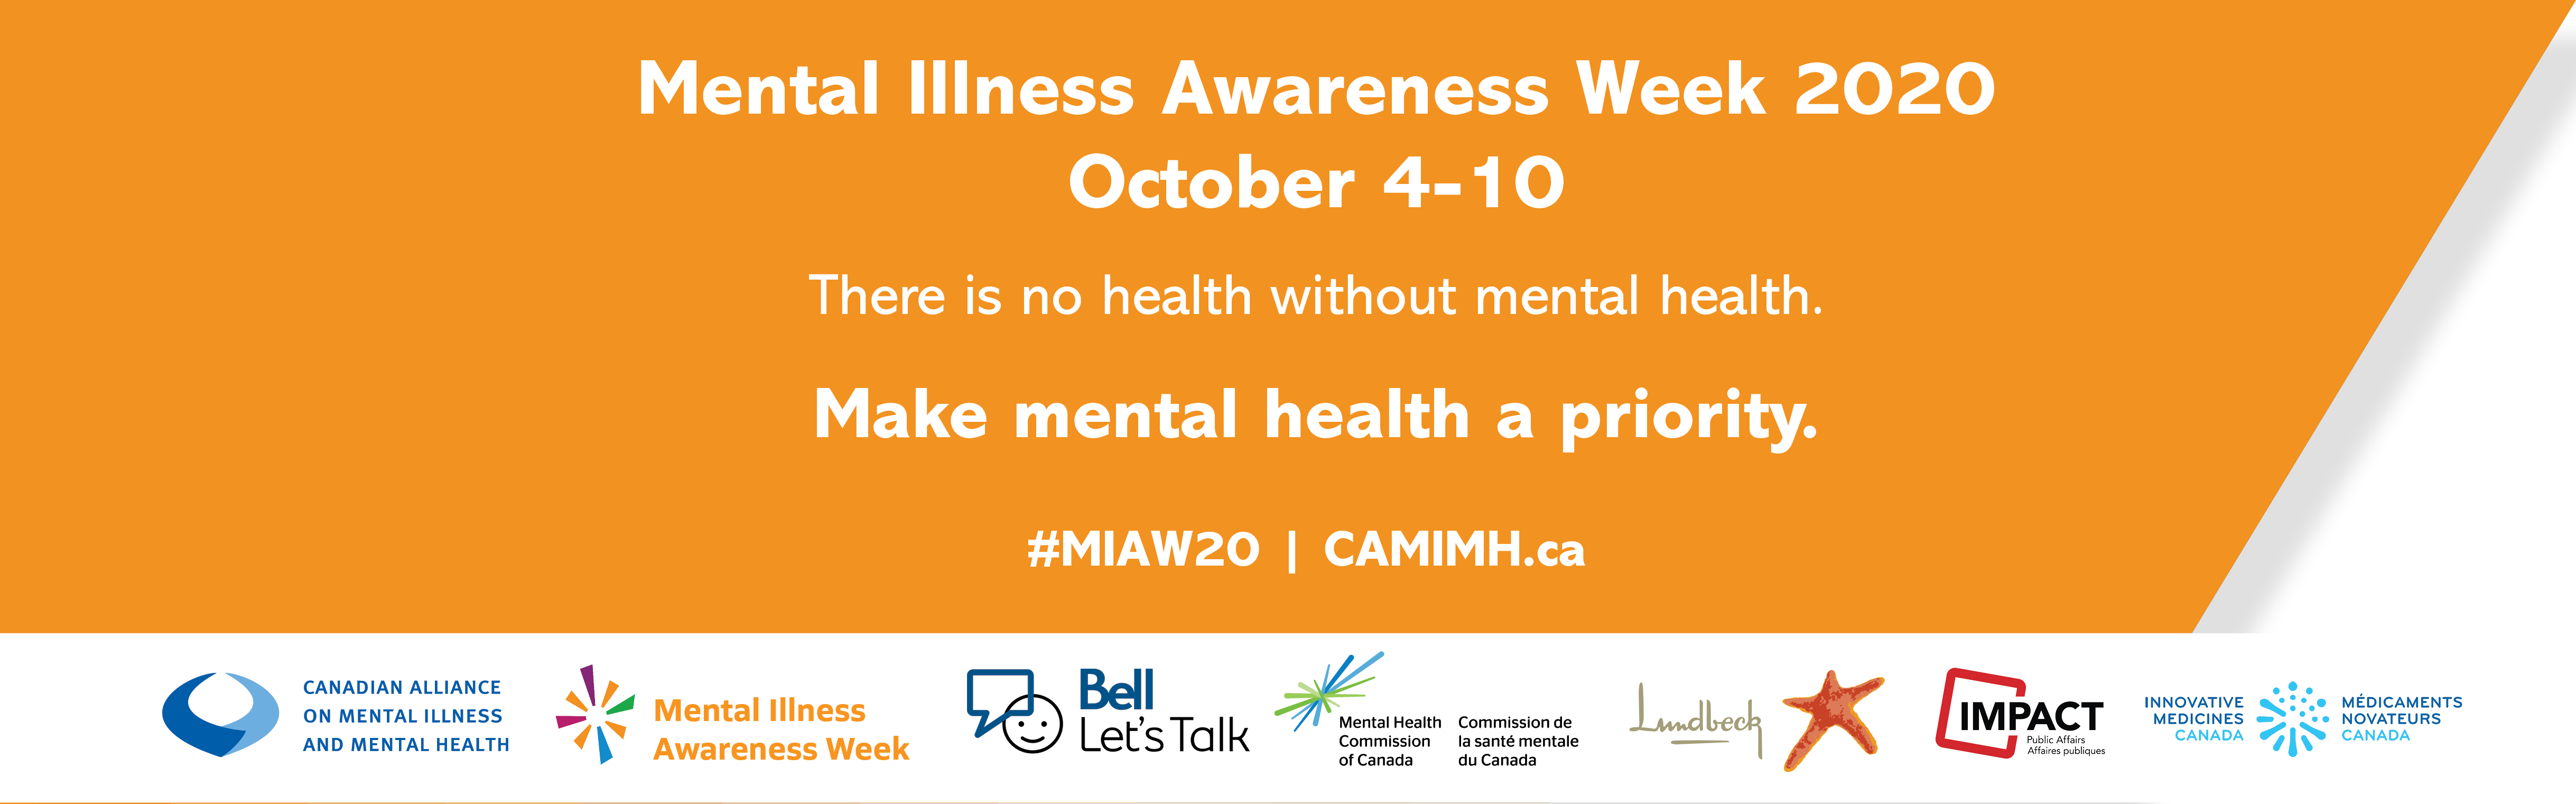 Mental Illness Awareness Week Oct. 4-10